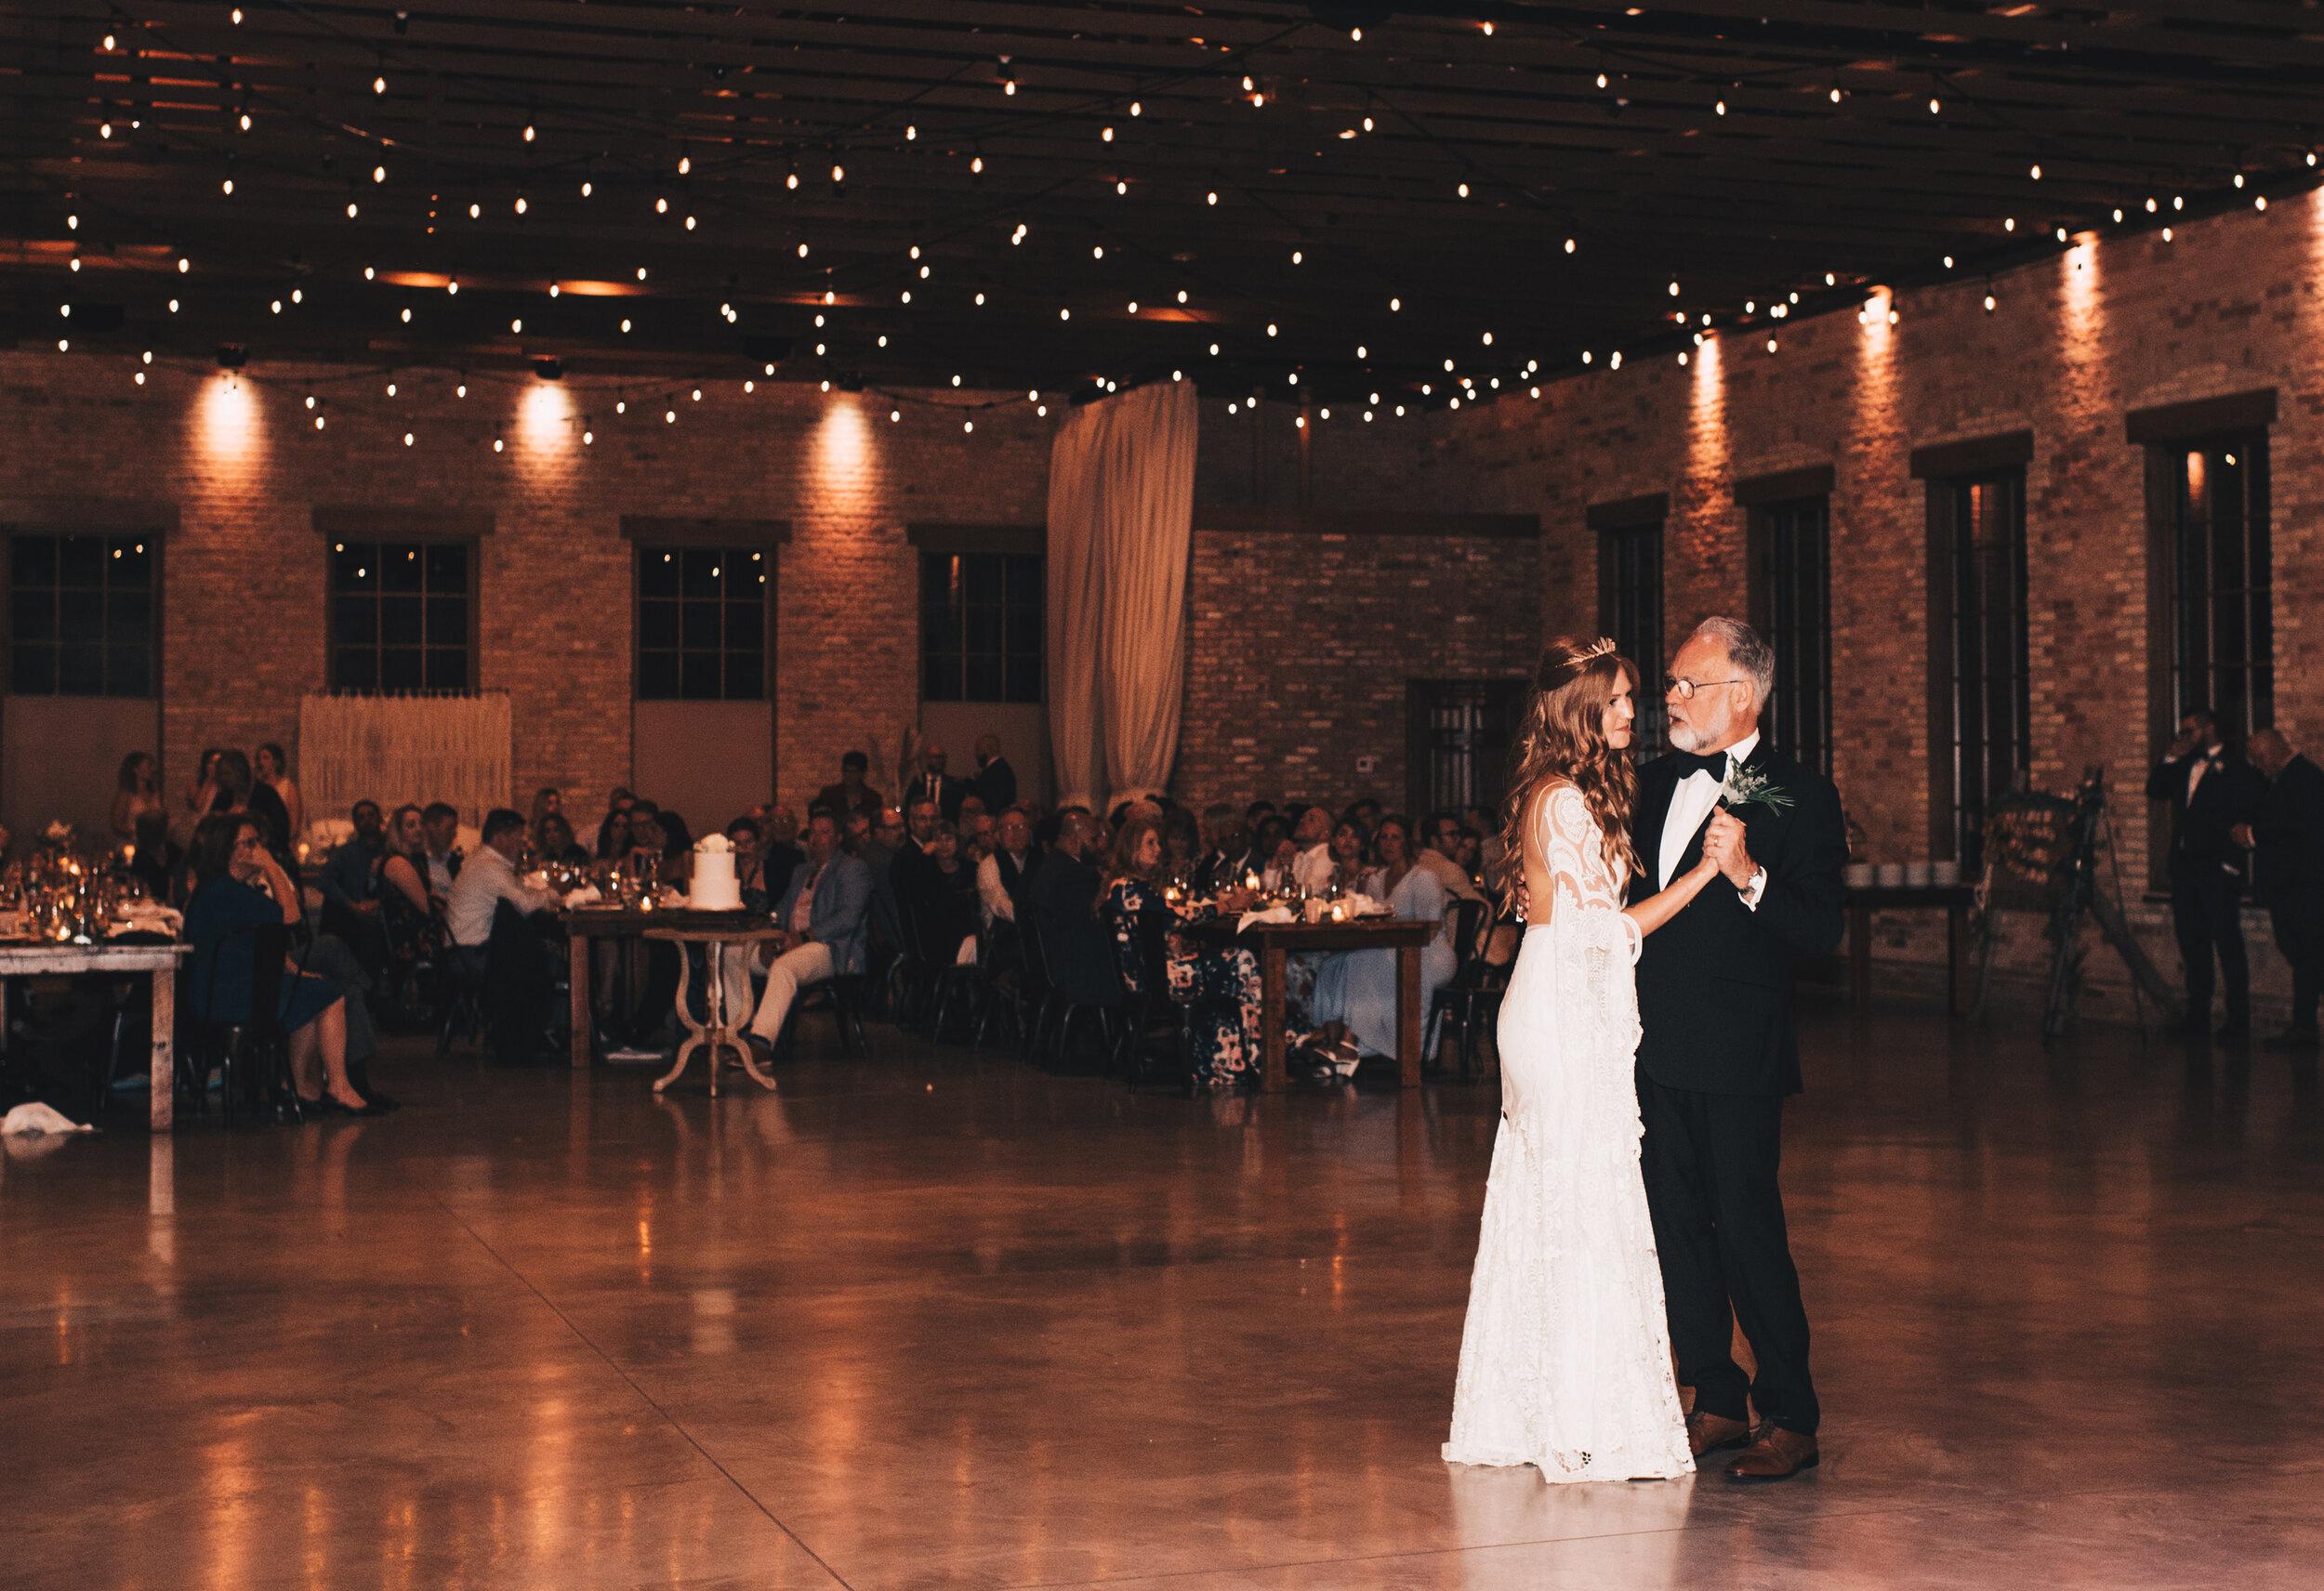 Modern Industrial Wedding, The Brix on the Fox, The BRIX, Chicago Industrial Wedding, Modern Midwest Wedding, The Brix on the Fox Wedding, The BRIX Wedding, First Dance Wedding Photos